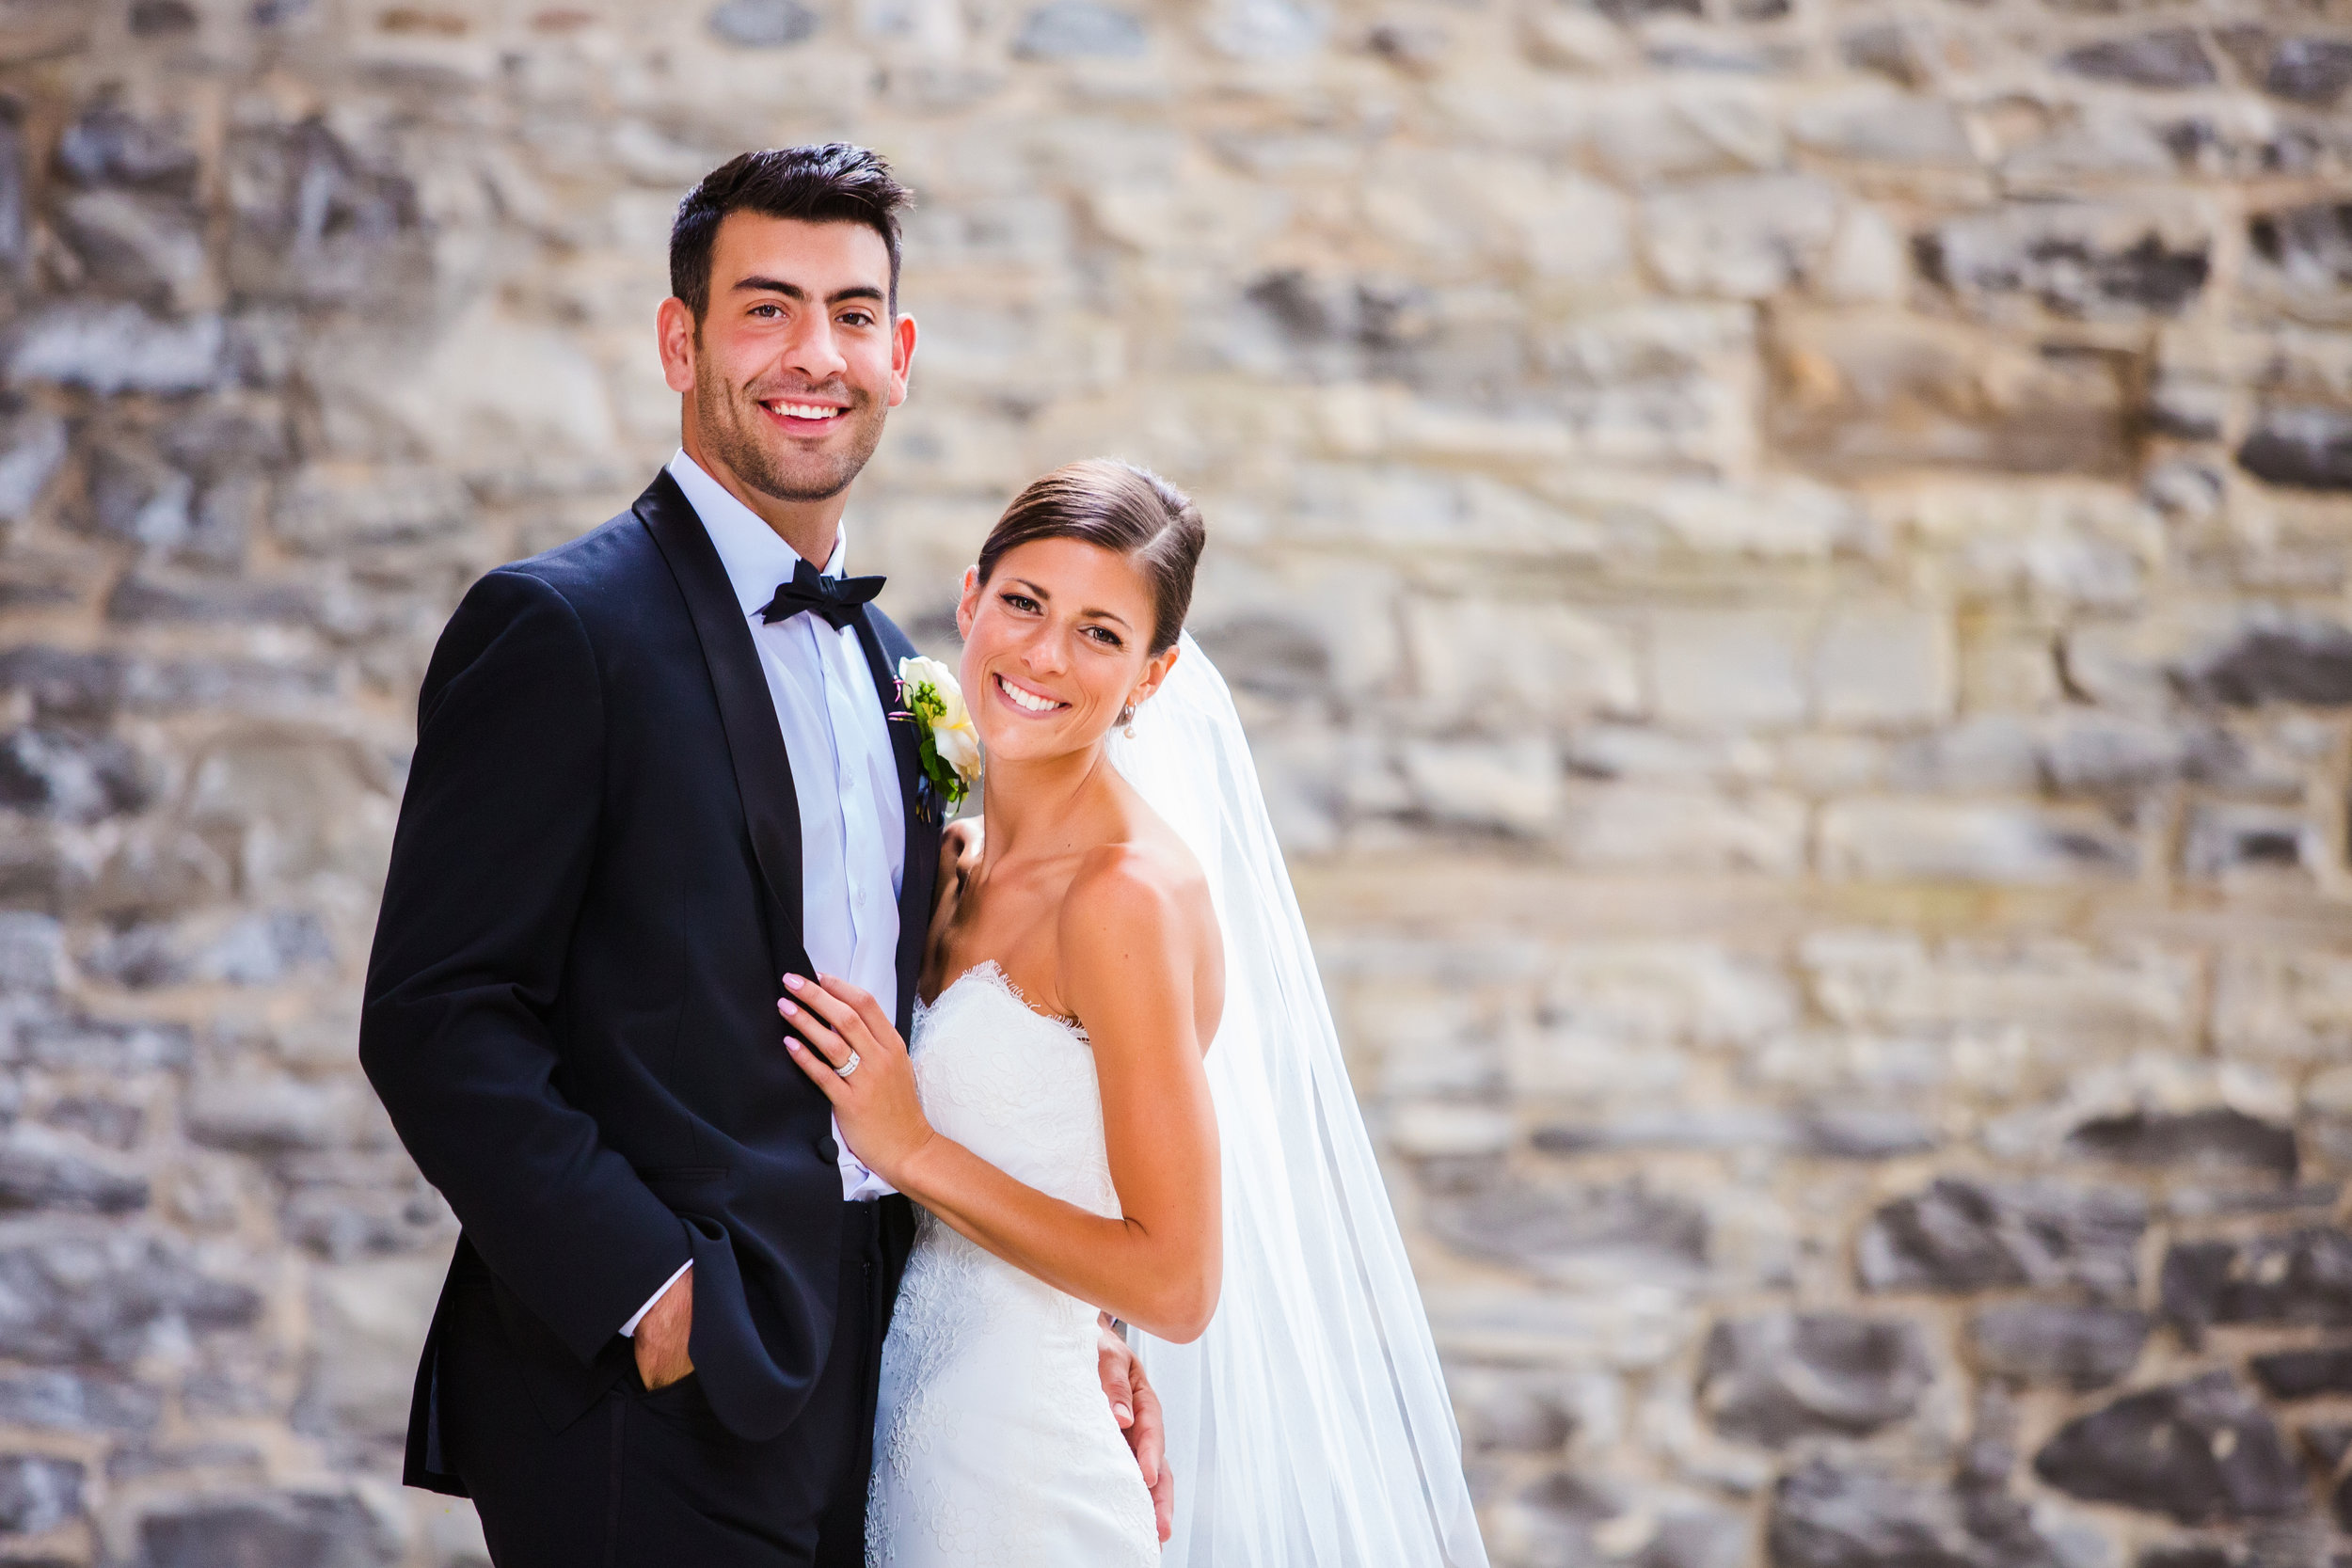 Haley Marks & Chris Mccarthy | Chapel Hill / Wintergarden by Monroe's